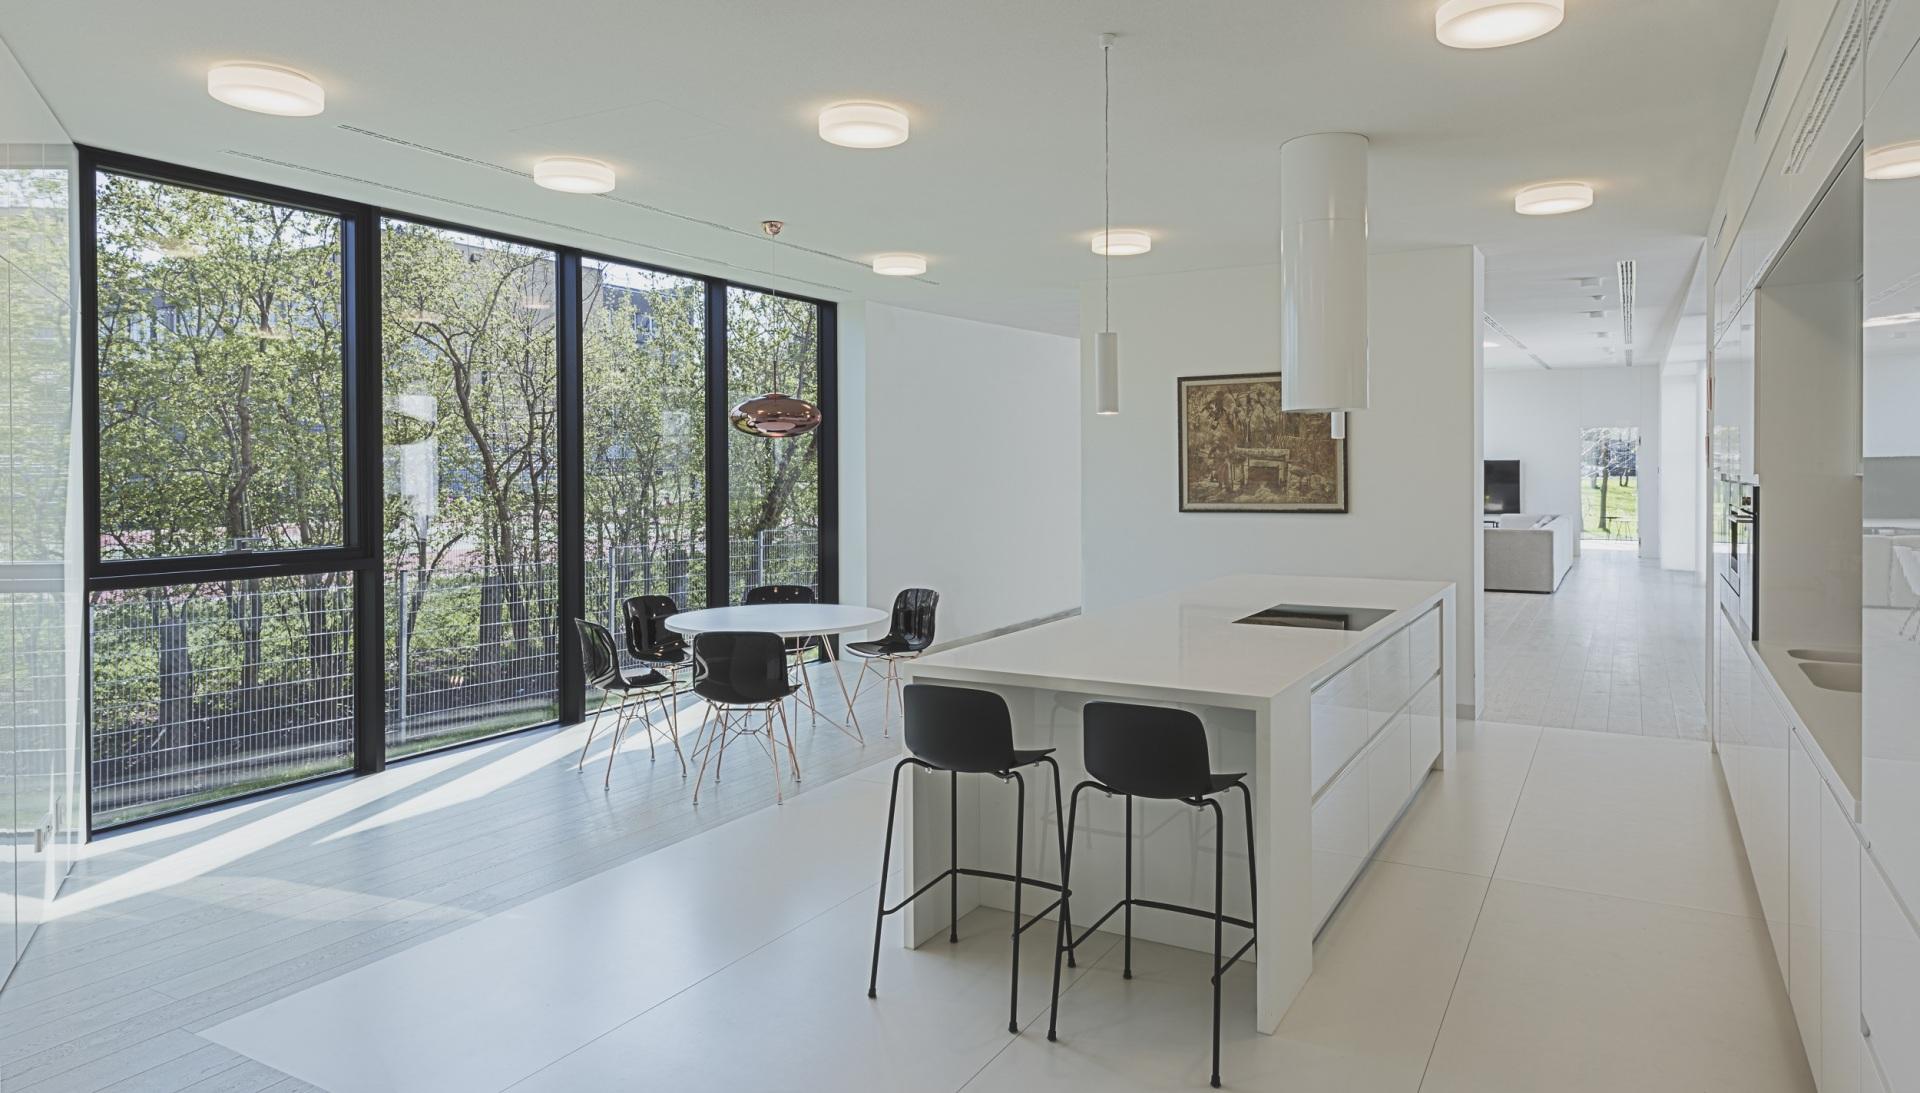 v_house_archistudio_designalive-9